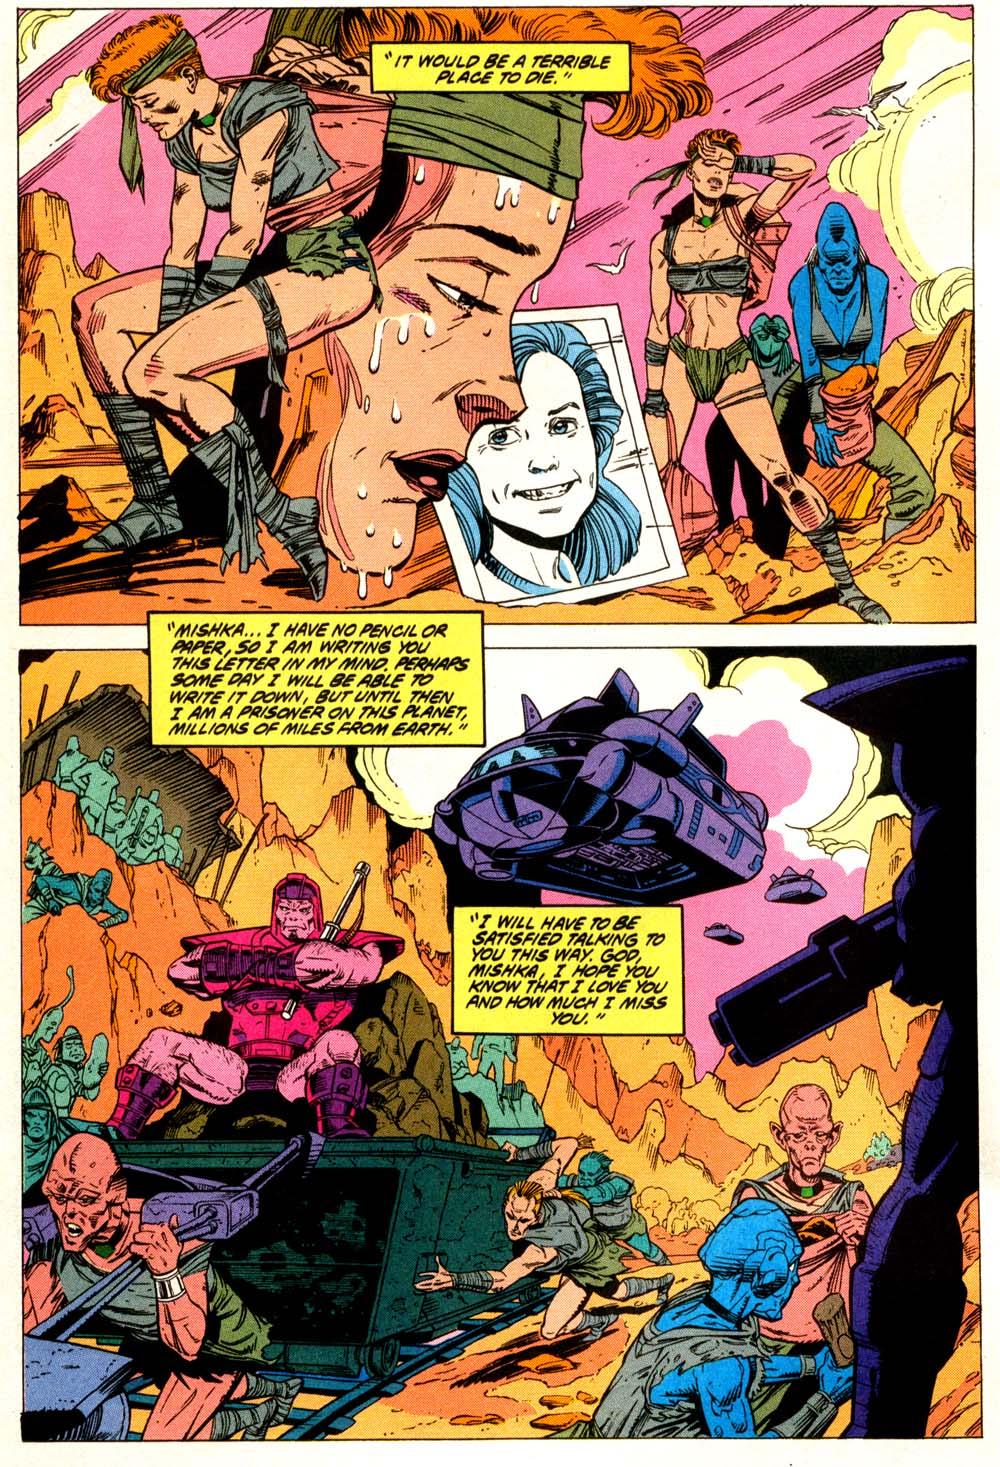 Read online Wonder Woman (1987) comic -  Issue #68 - 3